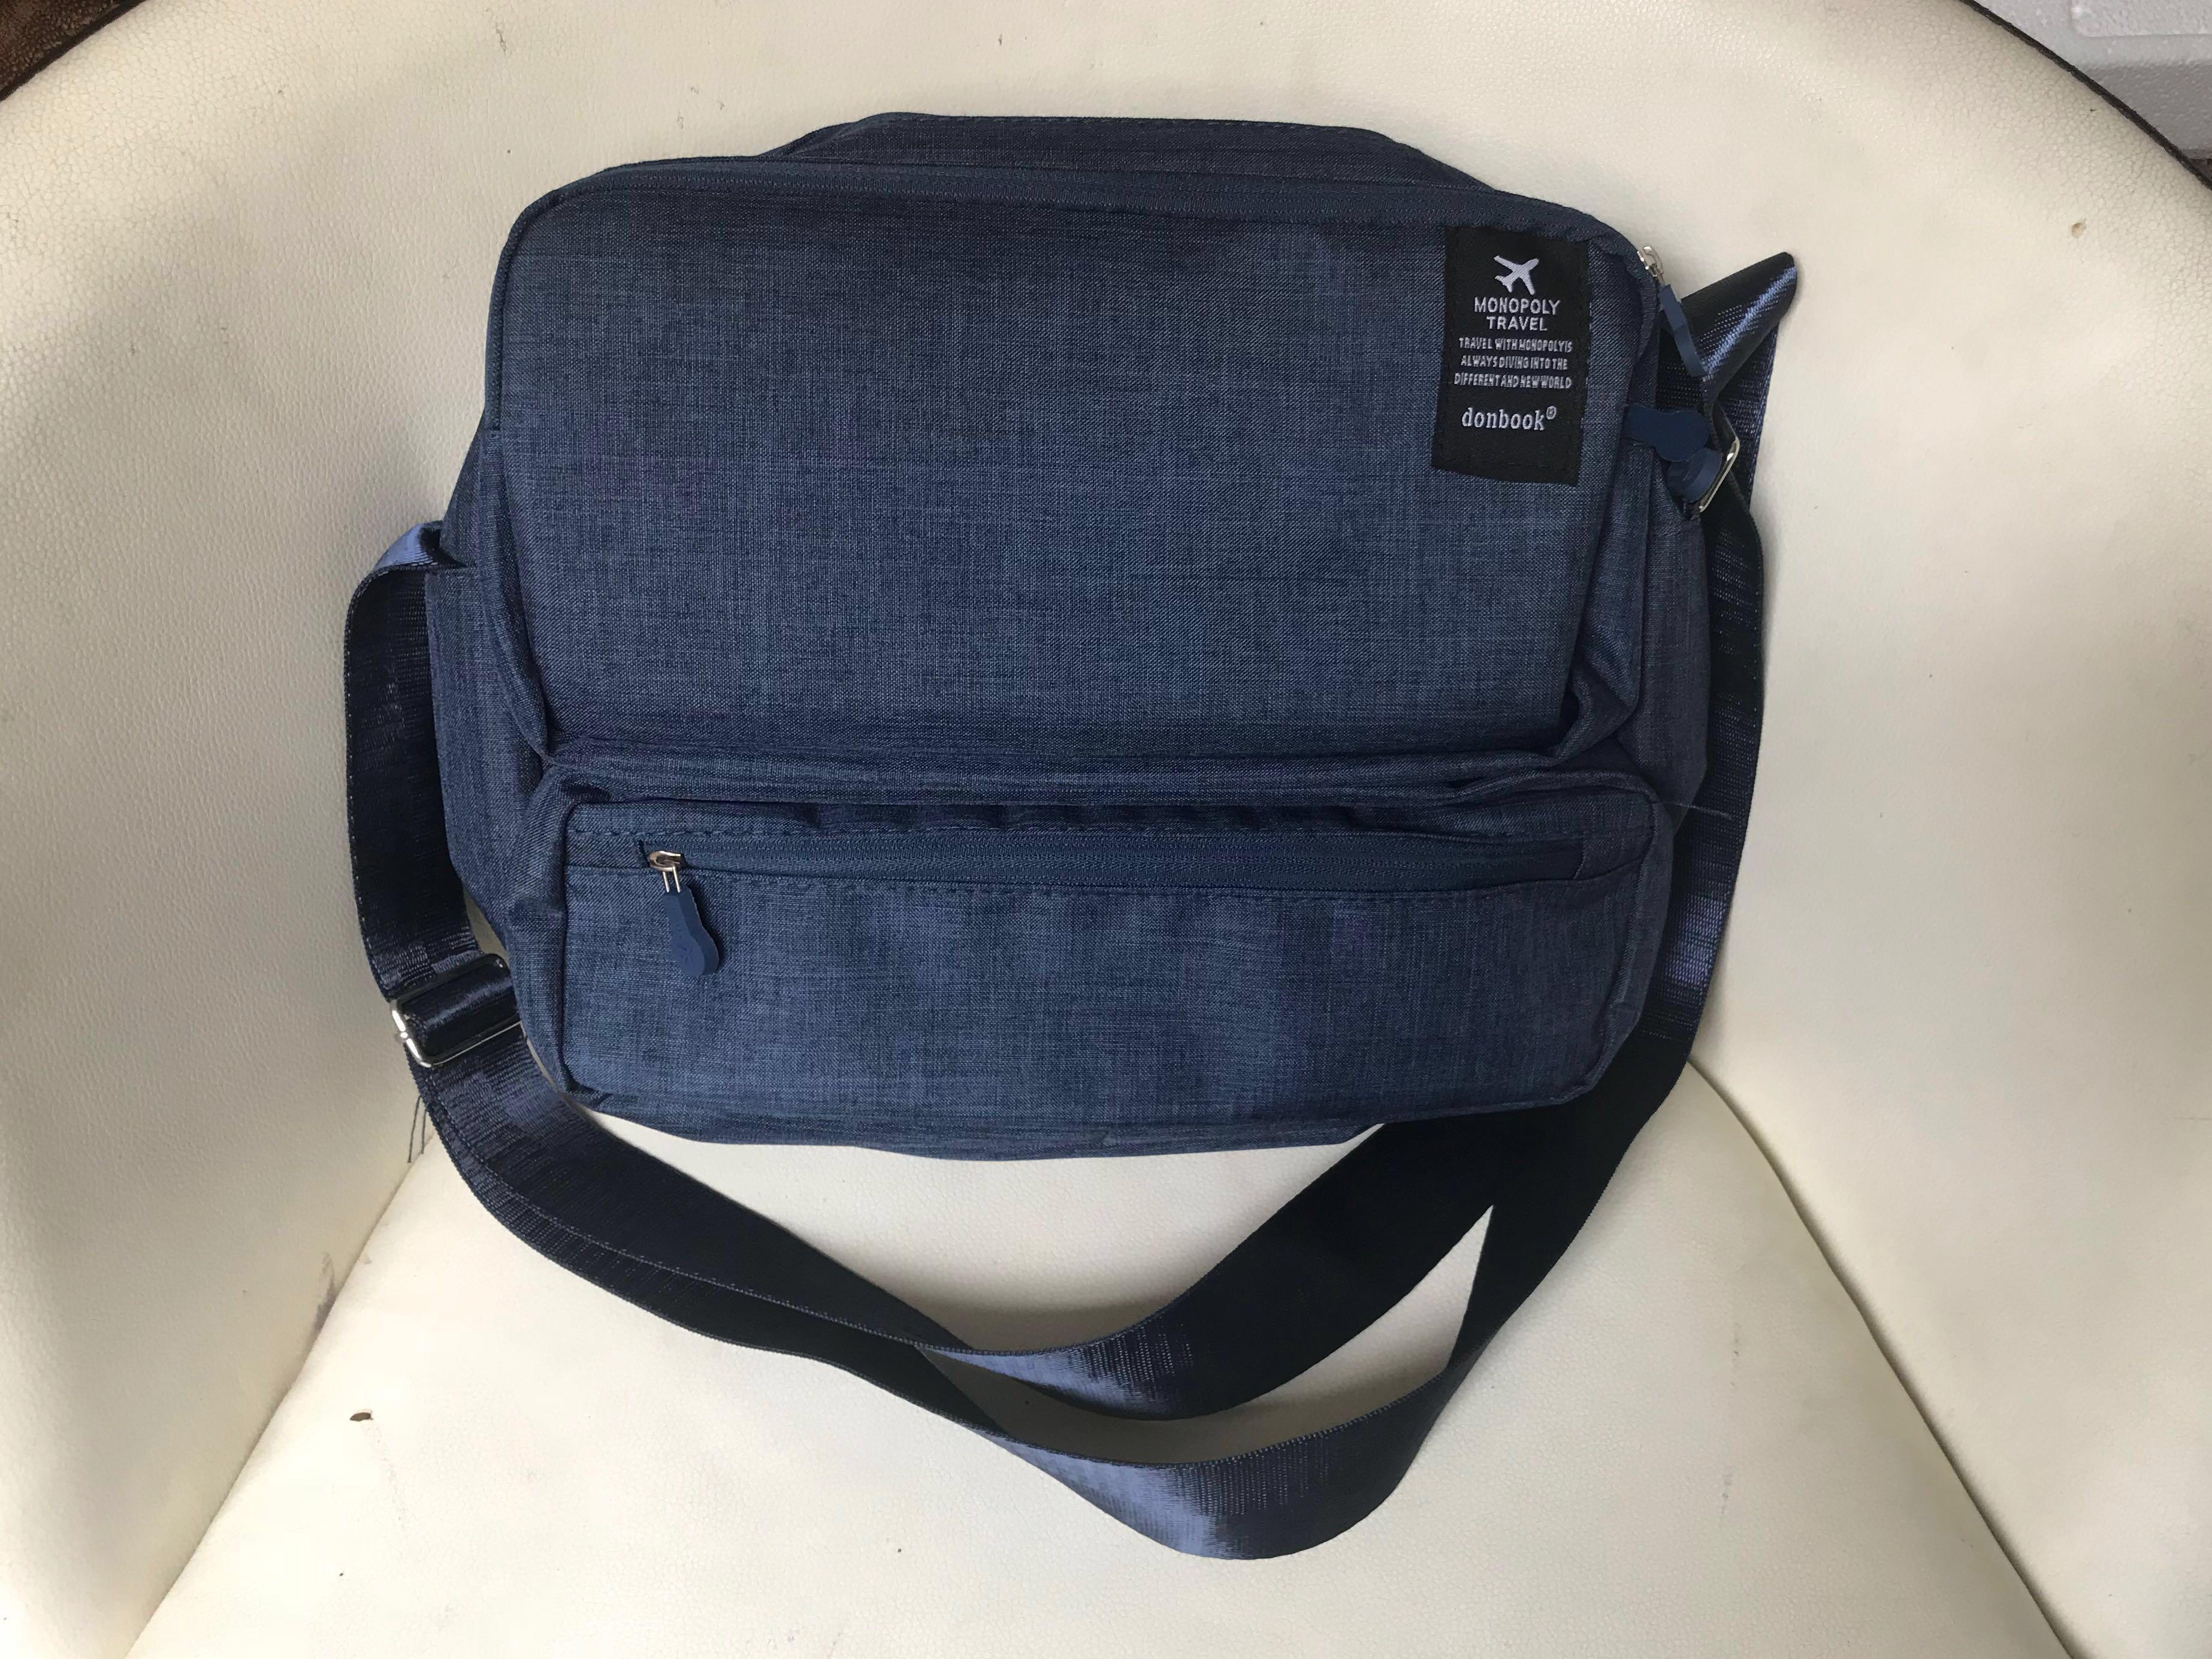 BNIB MONOPOLY Grand Voyaging Bag v.2 - Travel Bag Mens Bag Messenger Bag  Hand Bags, Men's Fashion, Bags & Wallets, Sling Bags on Carousell